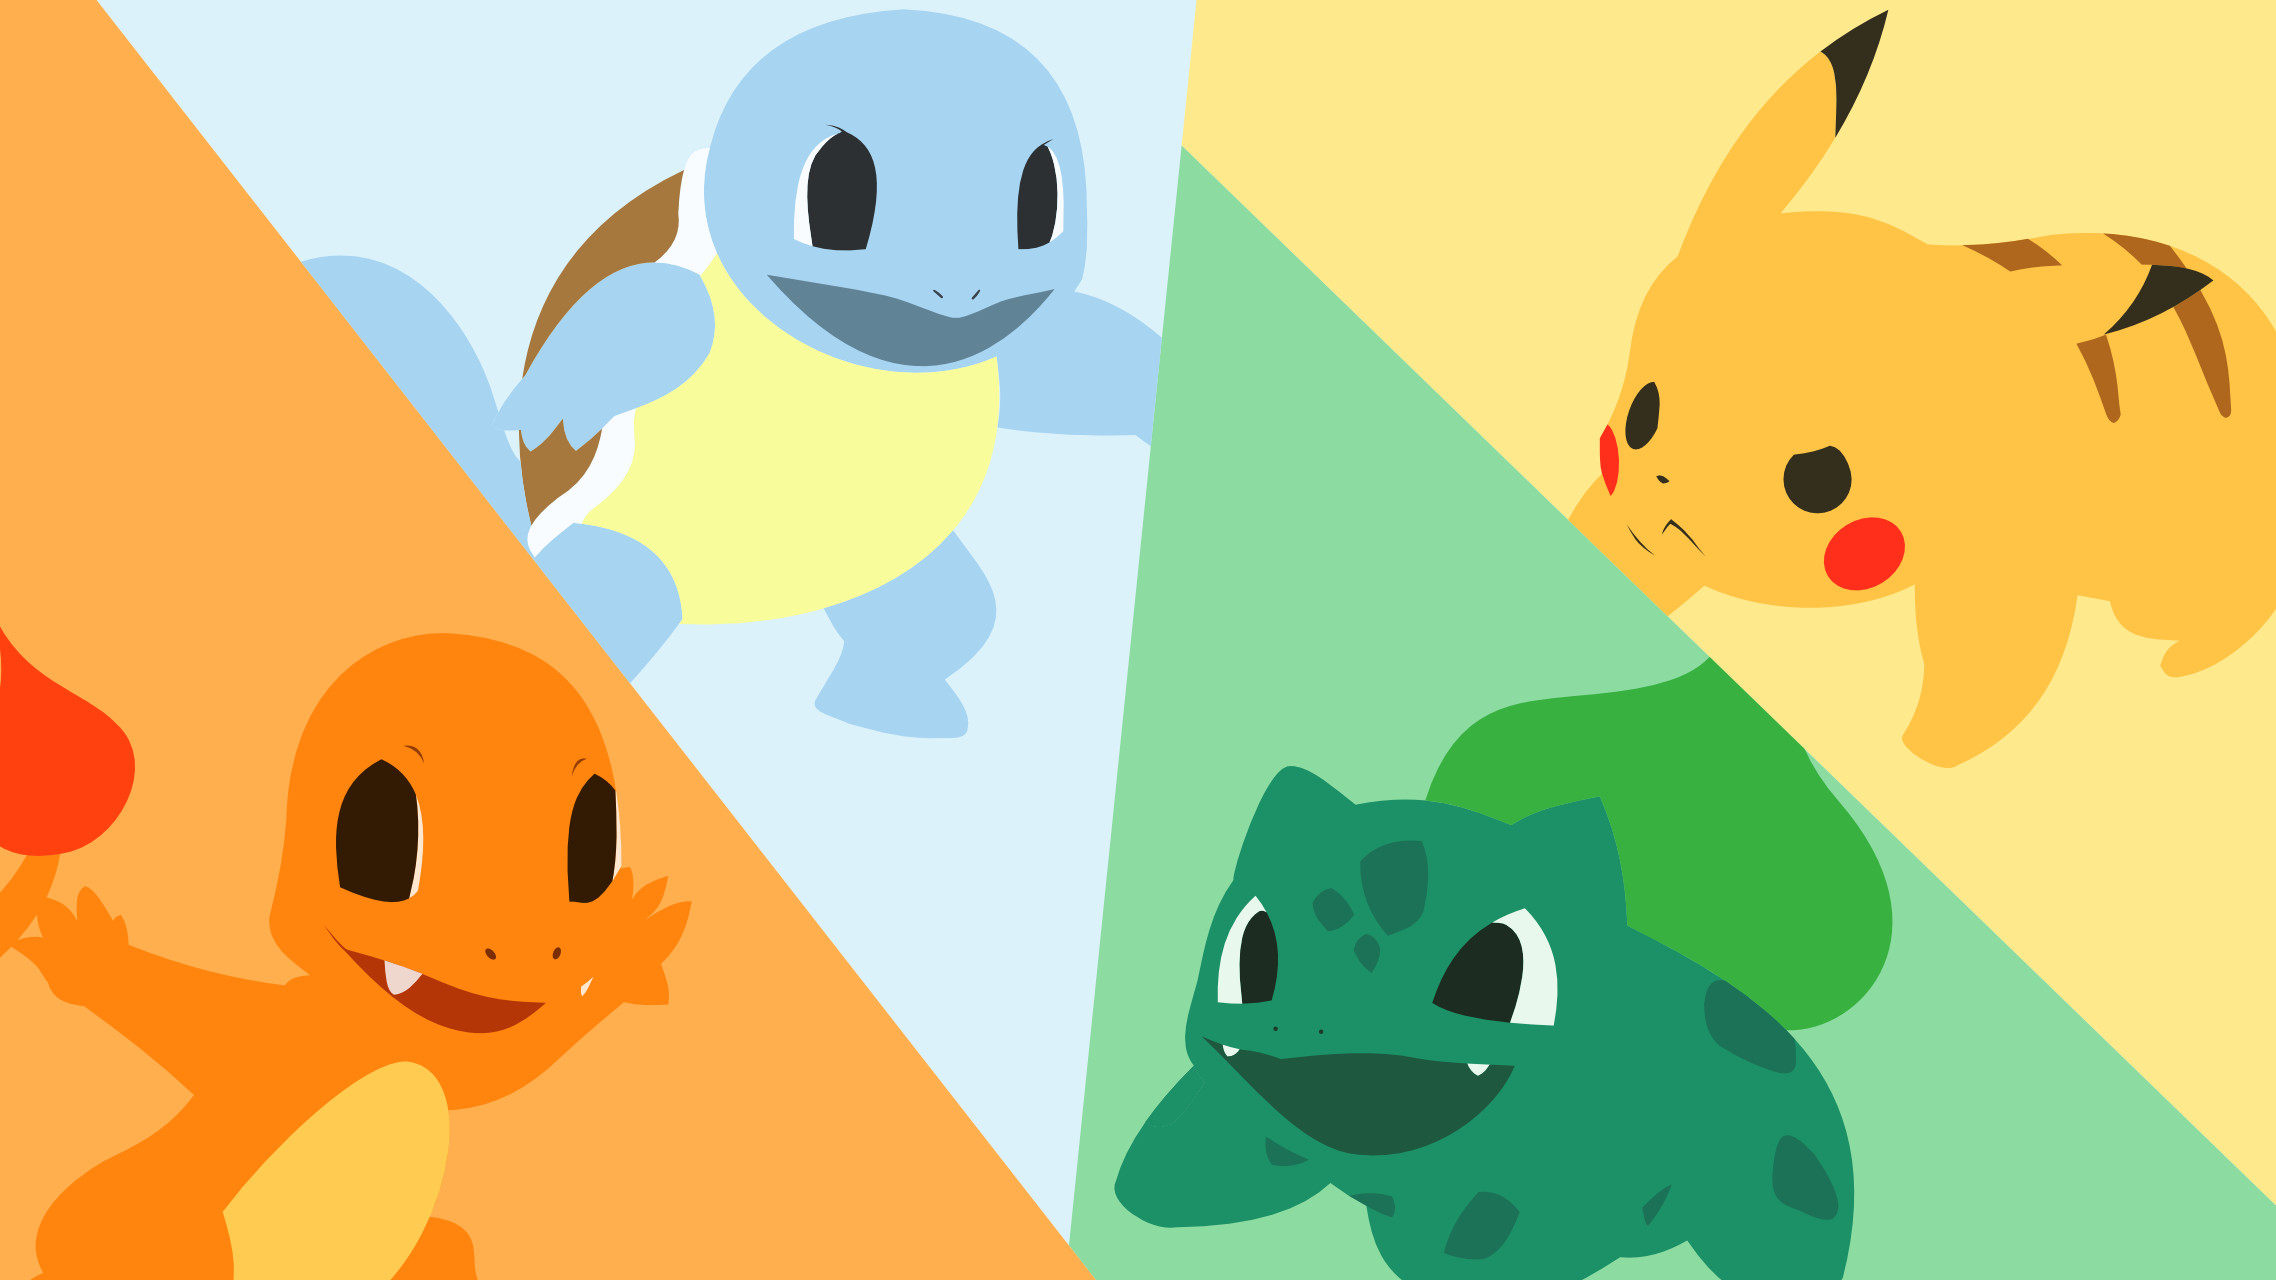 Video Game РPok̩mon Bulbasaur (Pok̩mon) Charmander (Pok̩mon) Squirtle ( Pok̩mon)